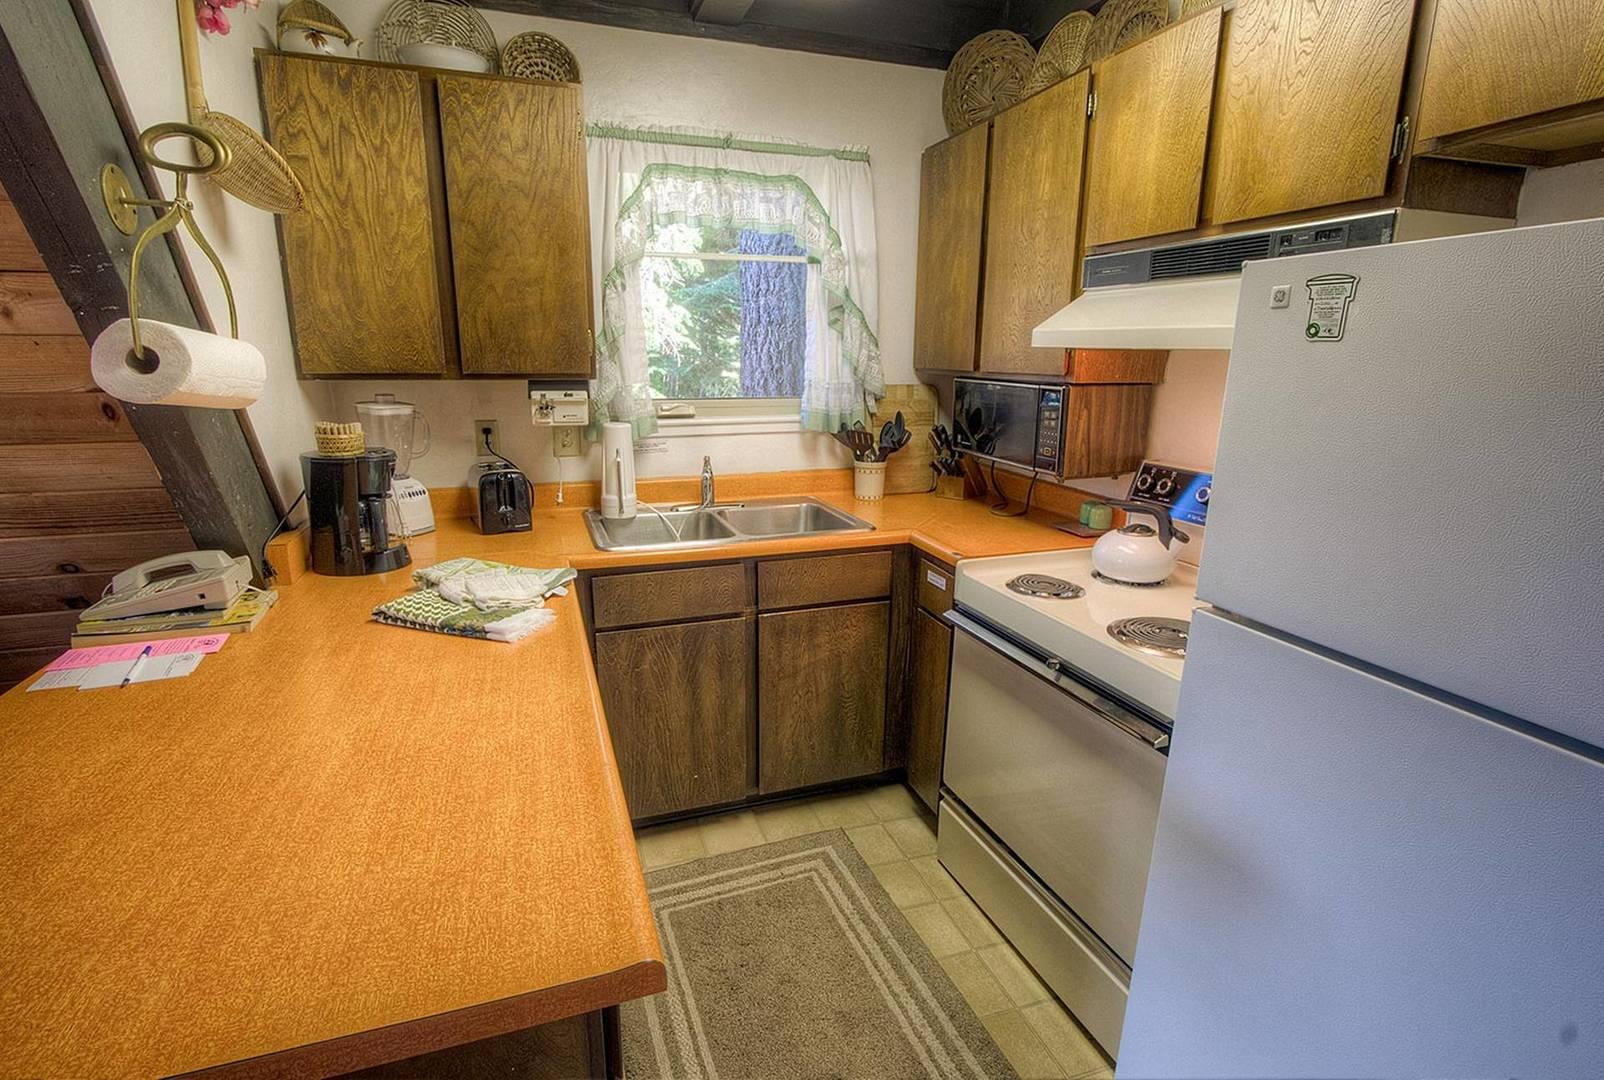 COH0653 Kitchen